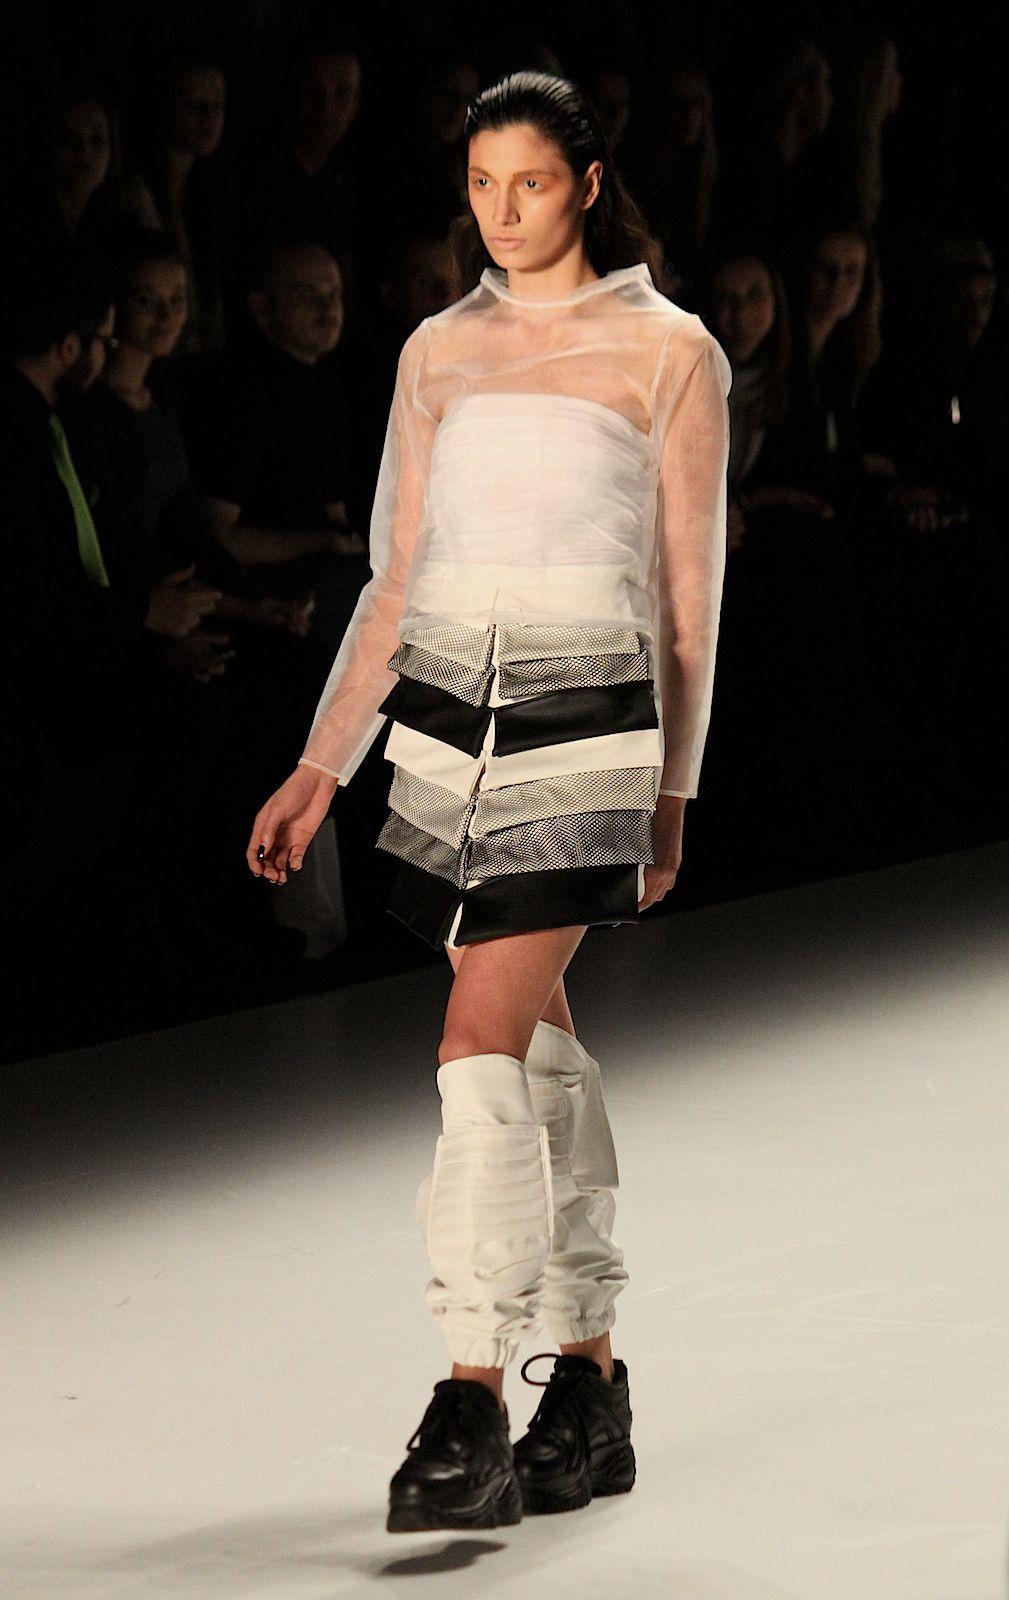 Pearly Wong Fashion Week Show